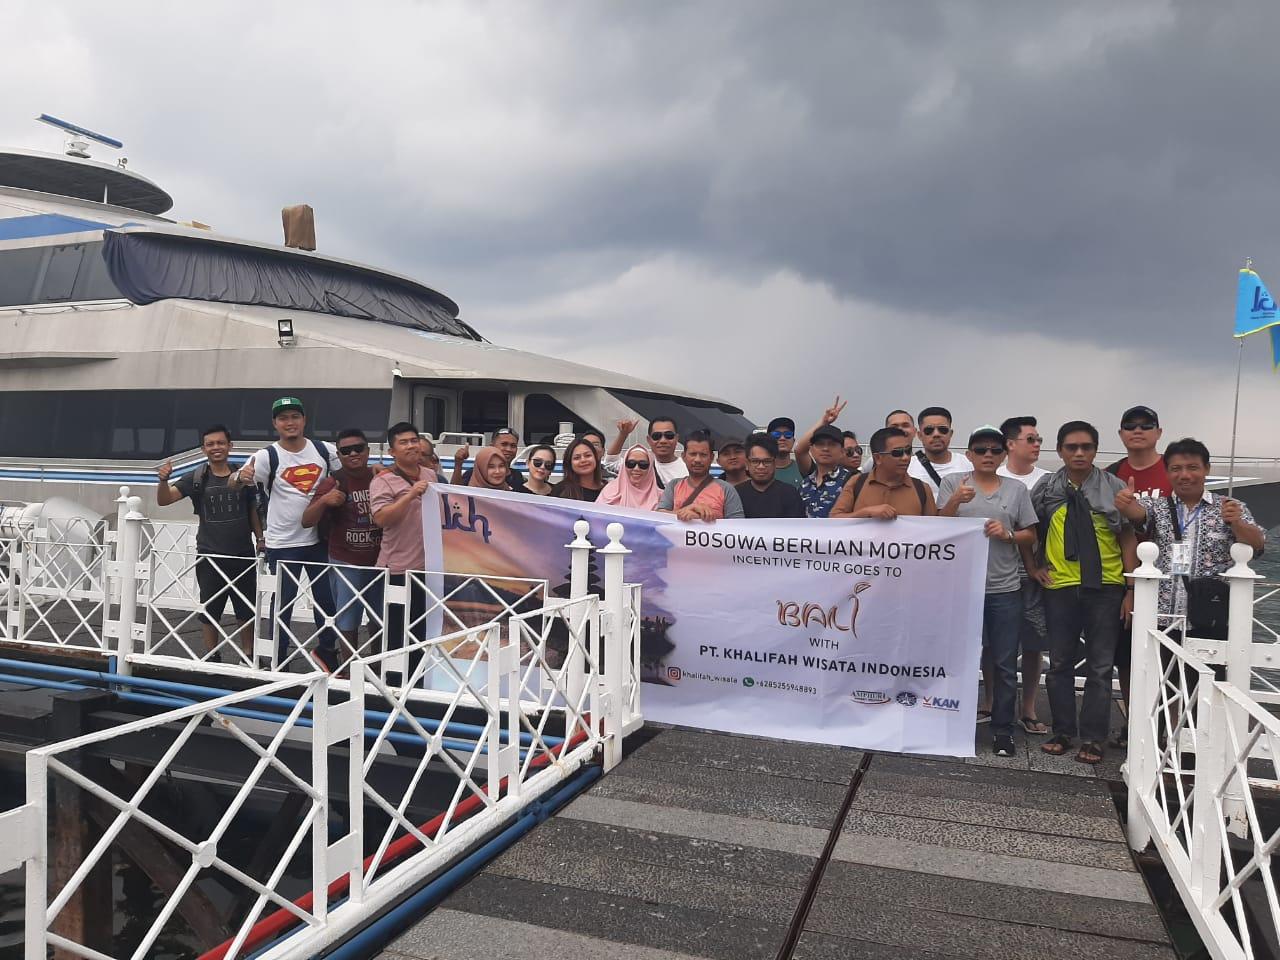 Grup Incentive tour Pt. Bosowa Berlian Motor Goes To Bali, Kunjungan ke Quicksilver Cruises(kapal pesiar)